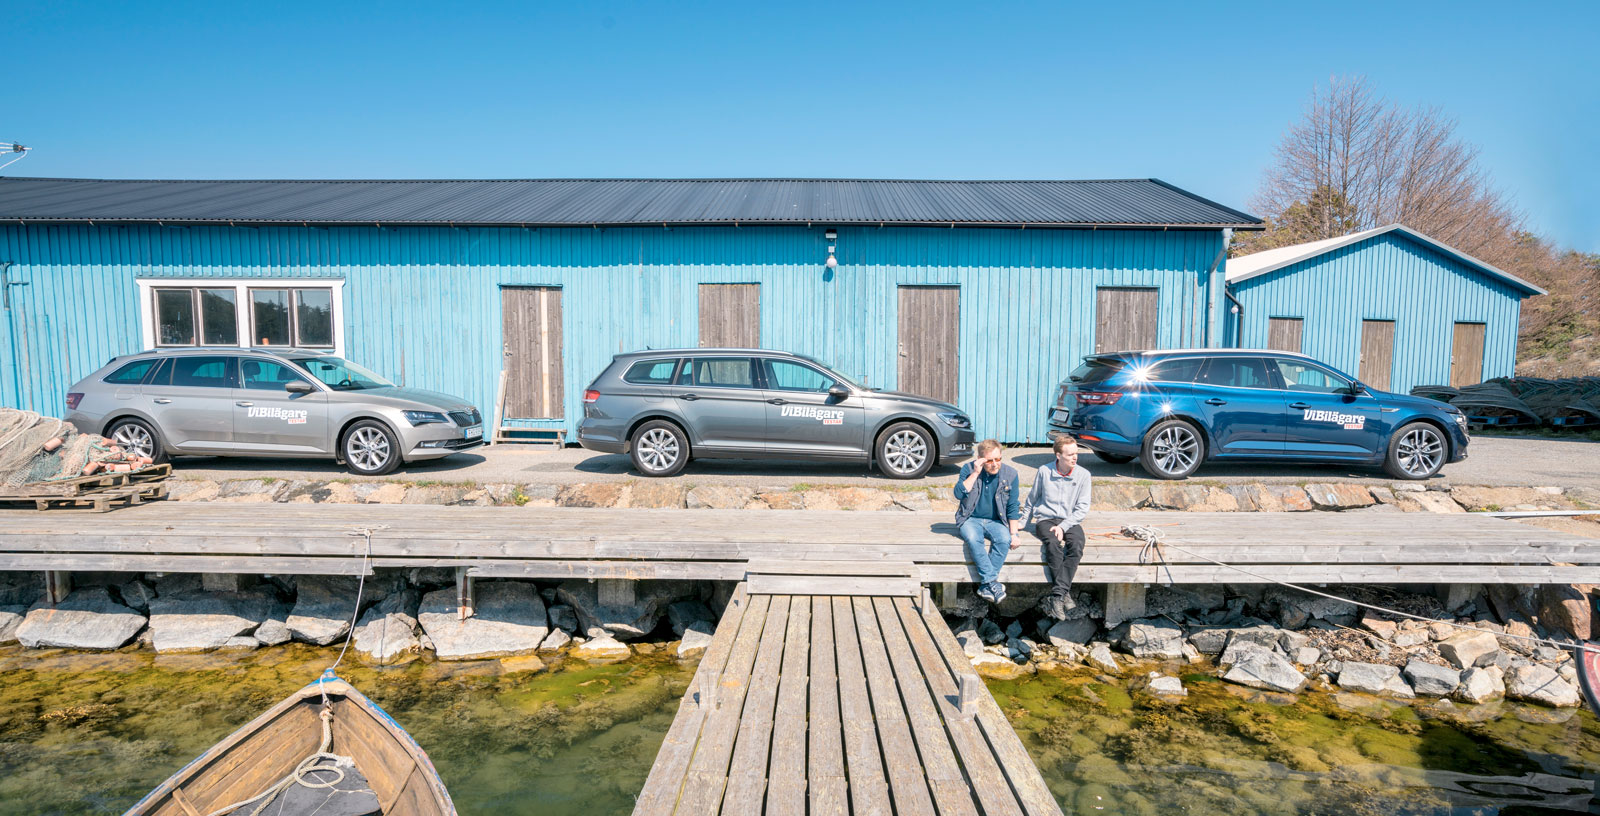 Test: Renault Talisman, Skoda Superb och Volkswagen Passat (2016)